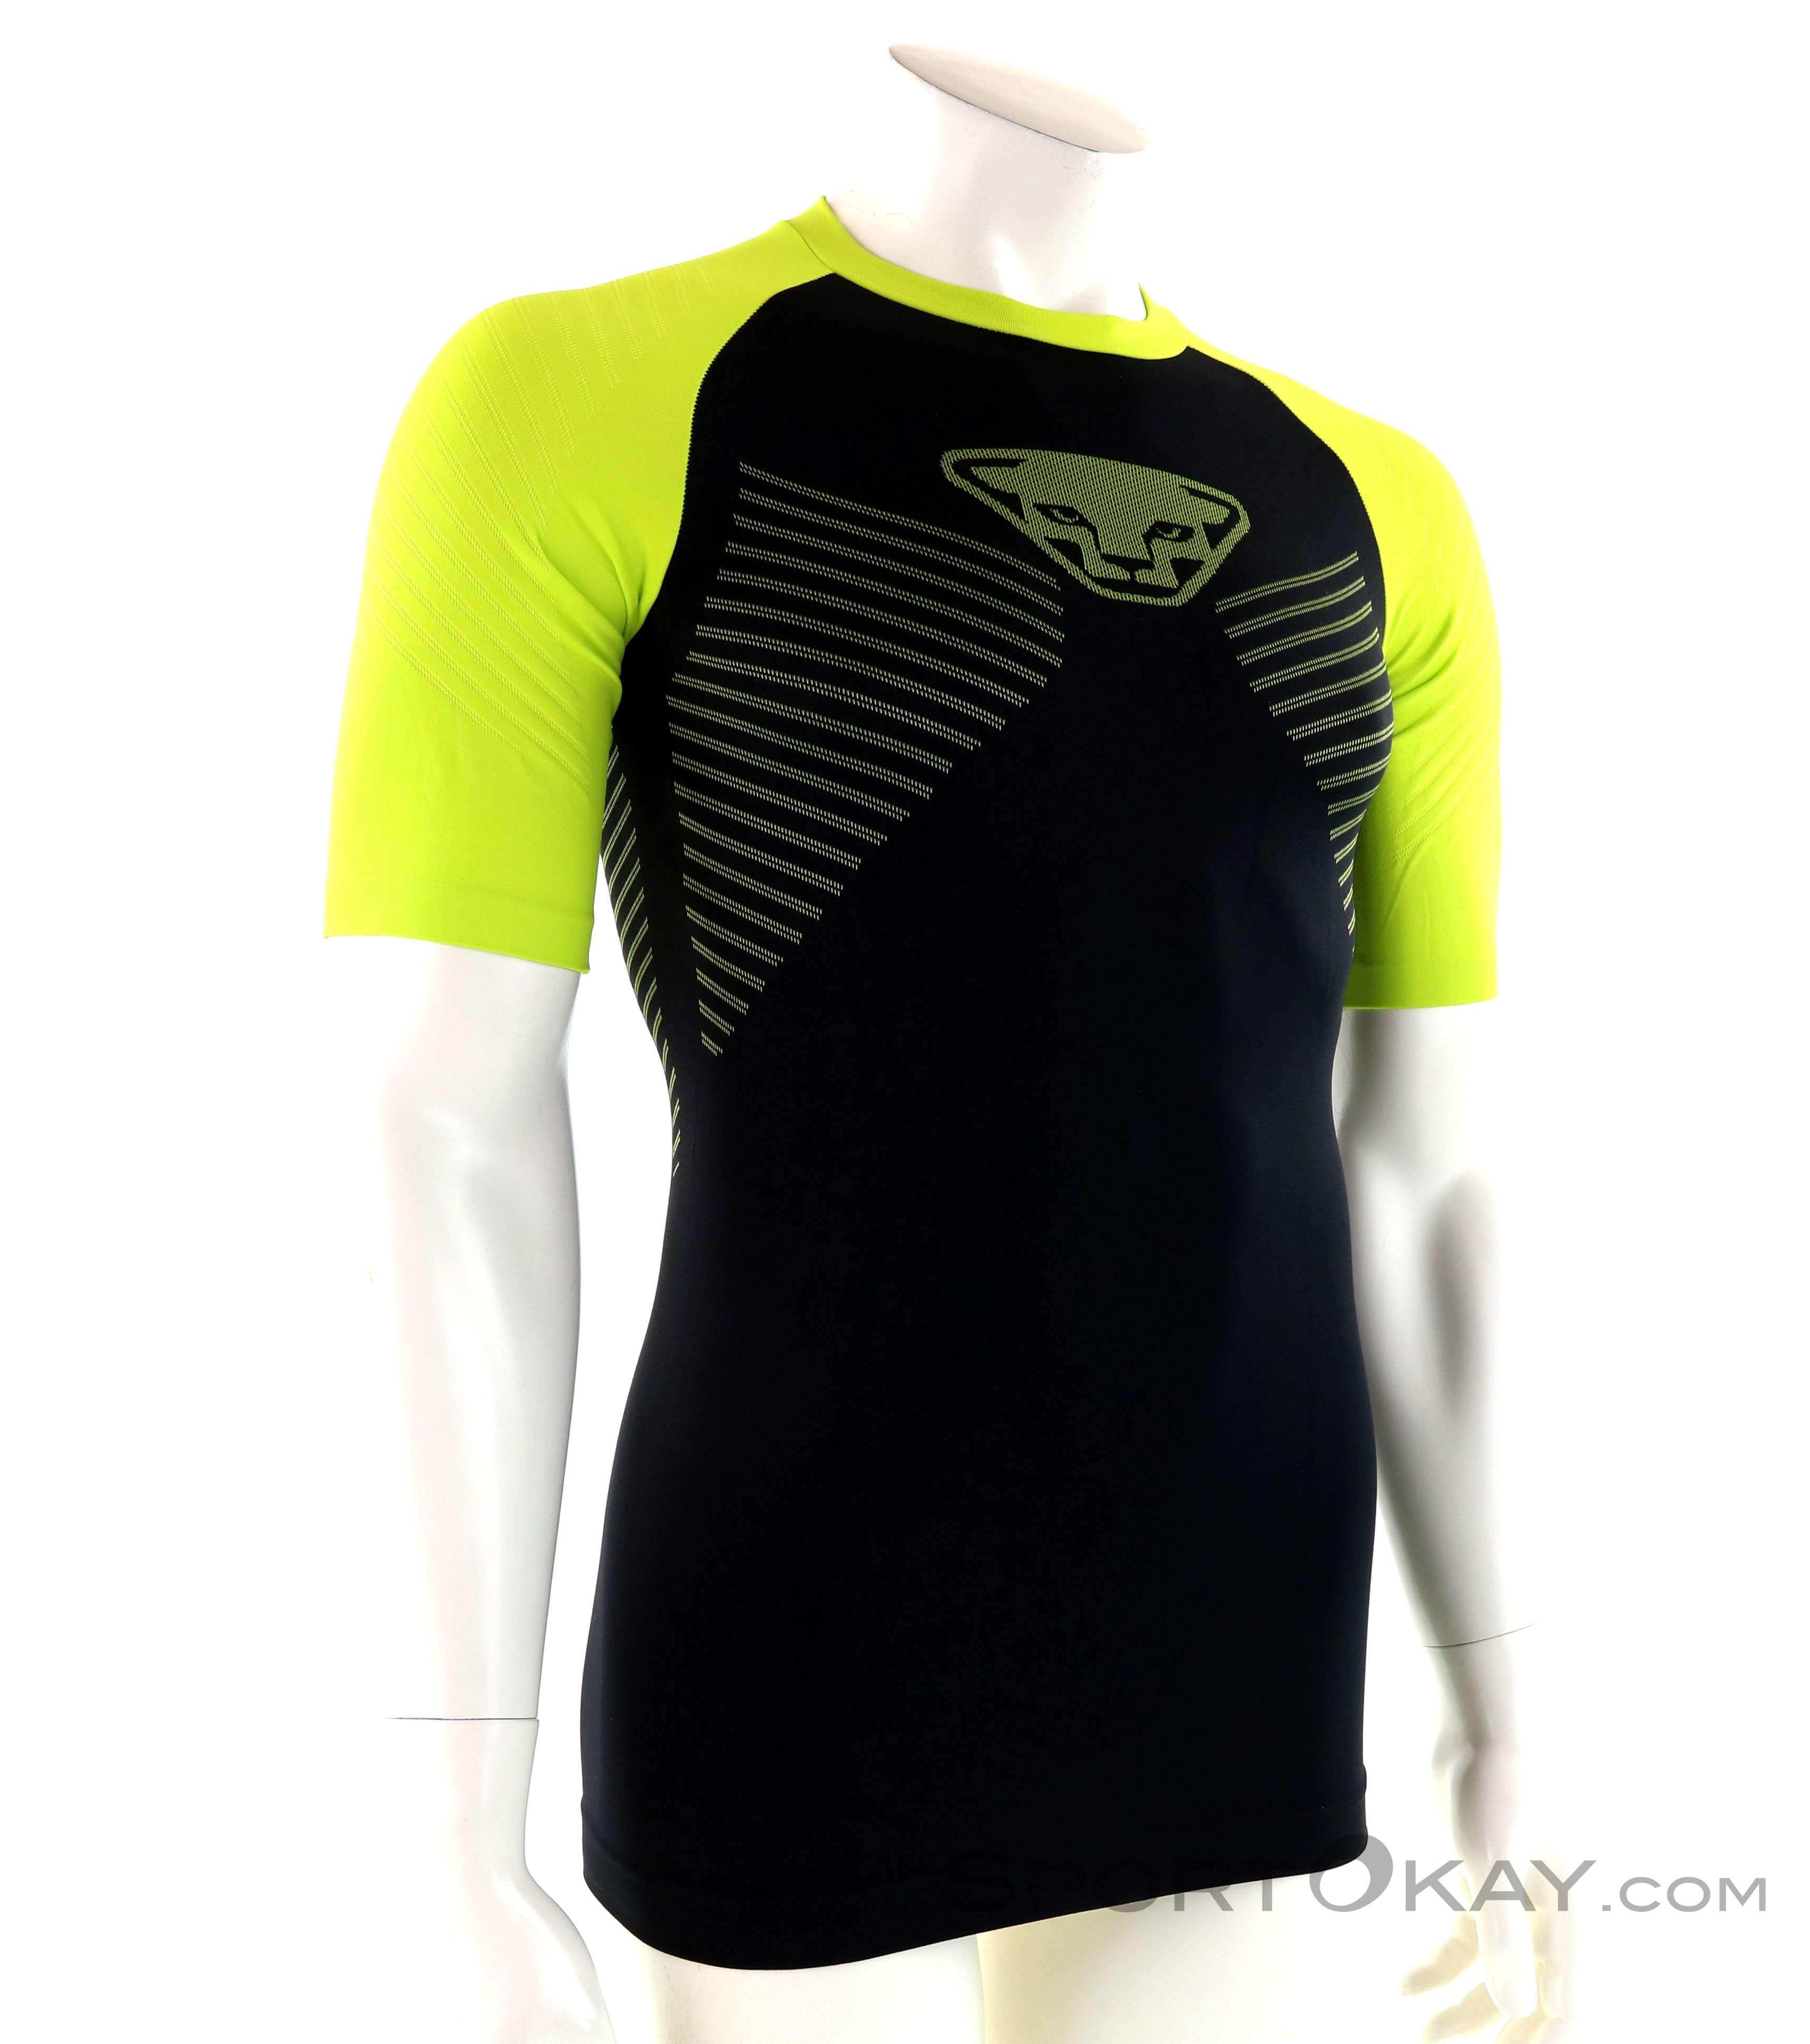 Dynafit Herren Alpine pro t-Shirt Funktionsshirt neu